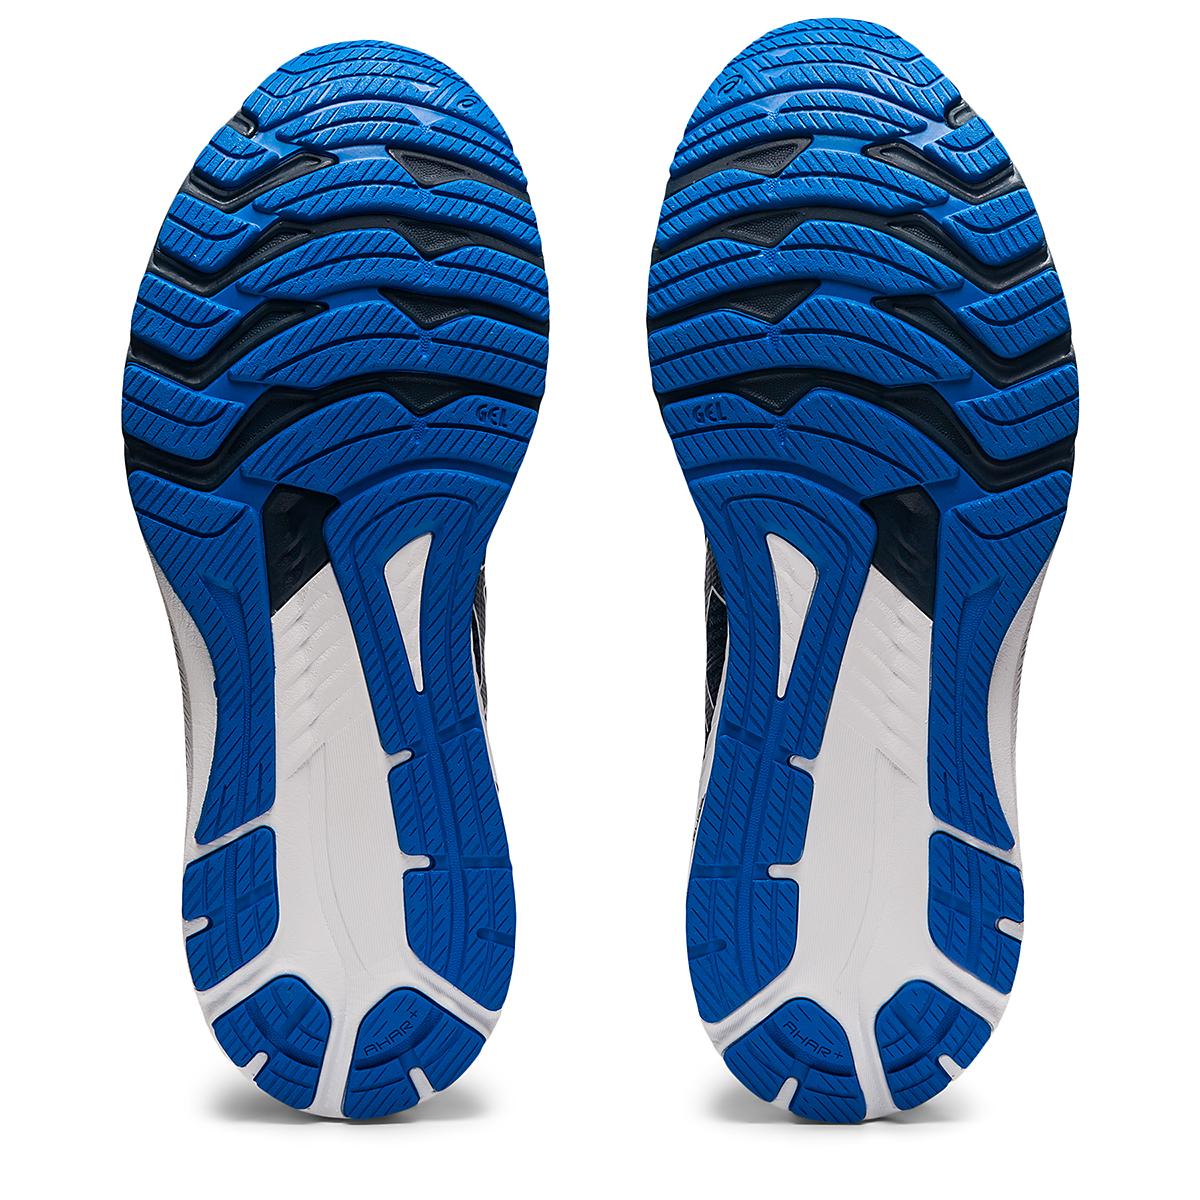 Men's Asics GT-2000 10 Running Shoe - Color: Thunder Blue/French Blue - Size: 7 - Width: Regular, Thunder Blue/French Blue, large, image 7